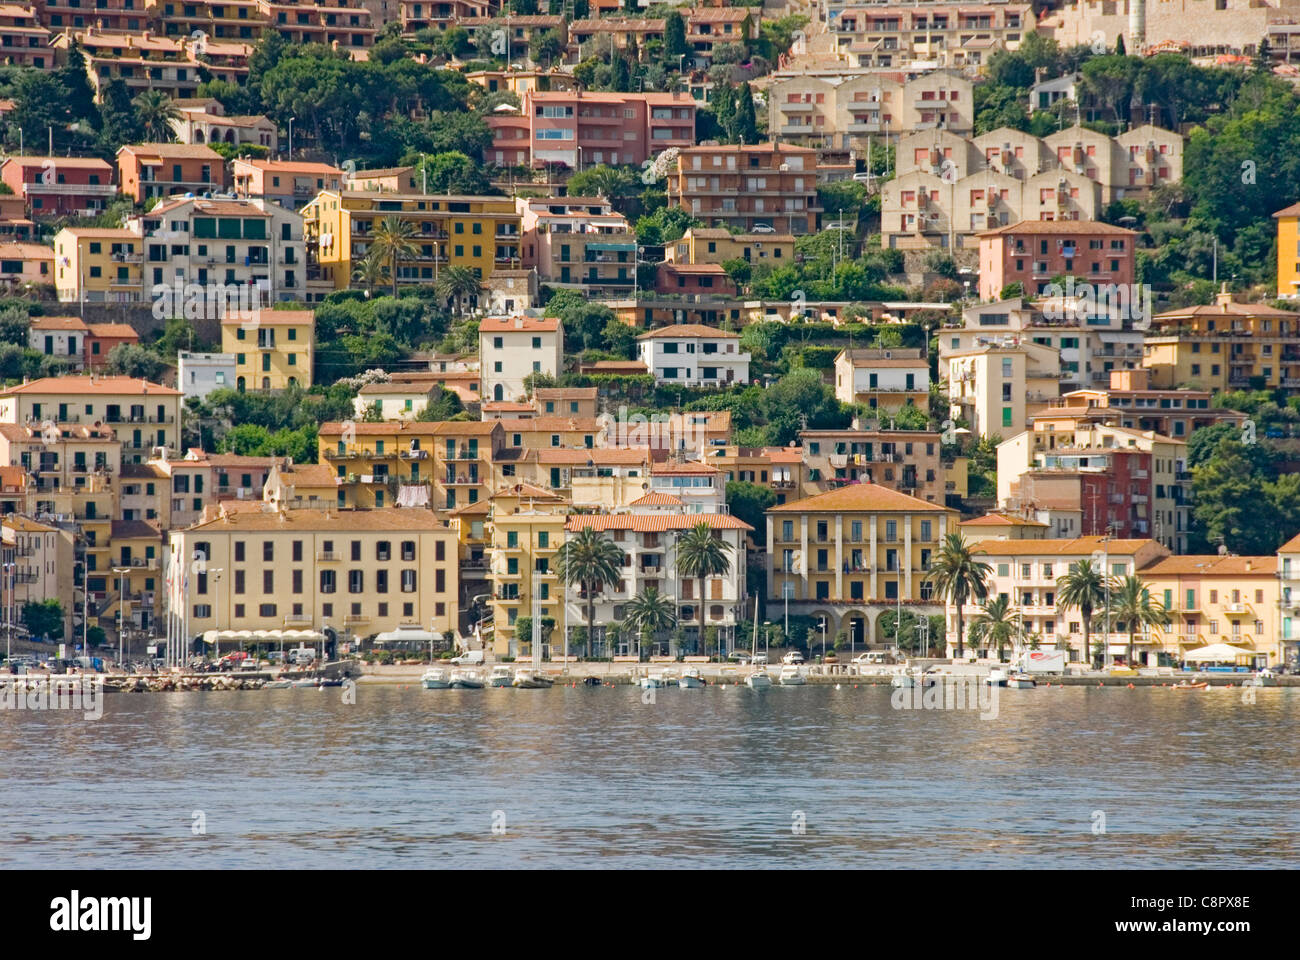 Italy, Tuscany, Monte Argentario, Porto Santo Stefano - Stock Image